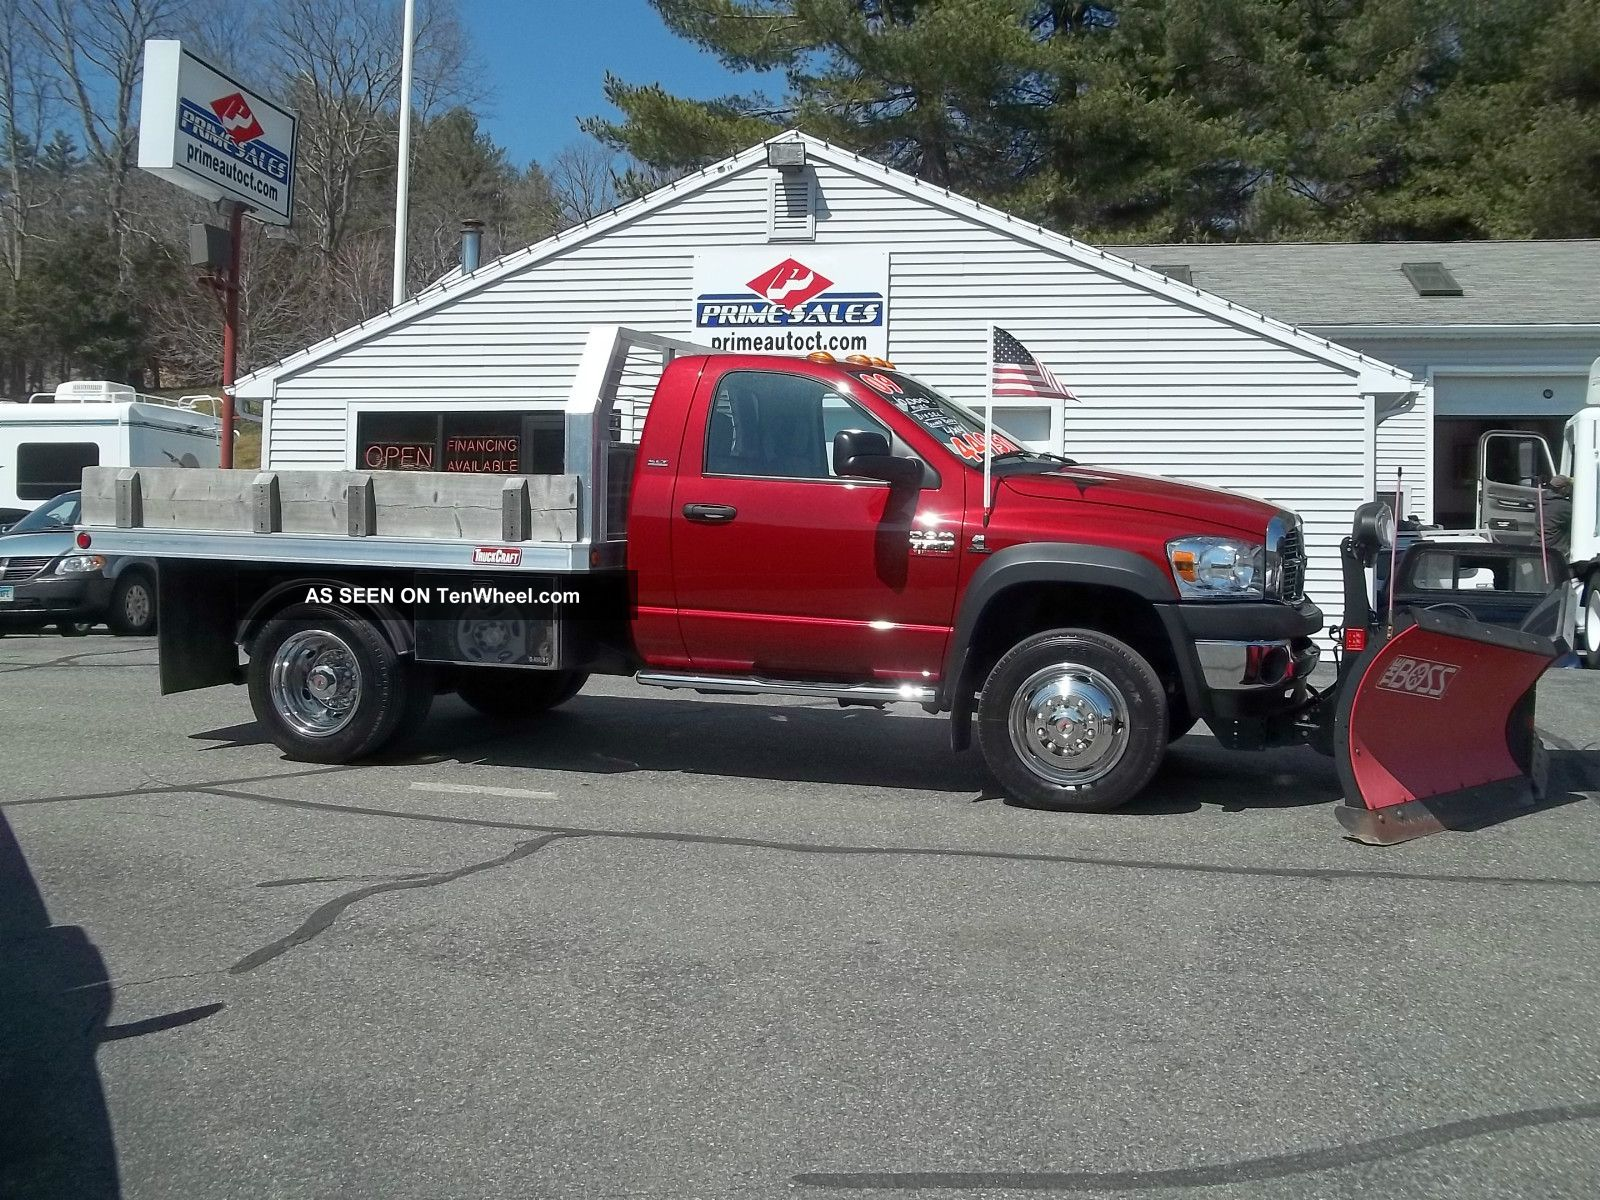 2009 Dodge Ram 5500 Cummins Diesel Flatbed Dump 4x4 Slt ...